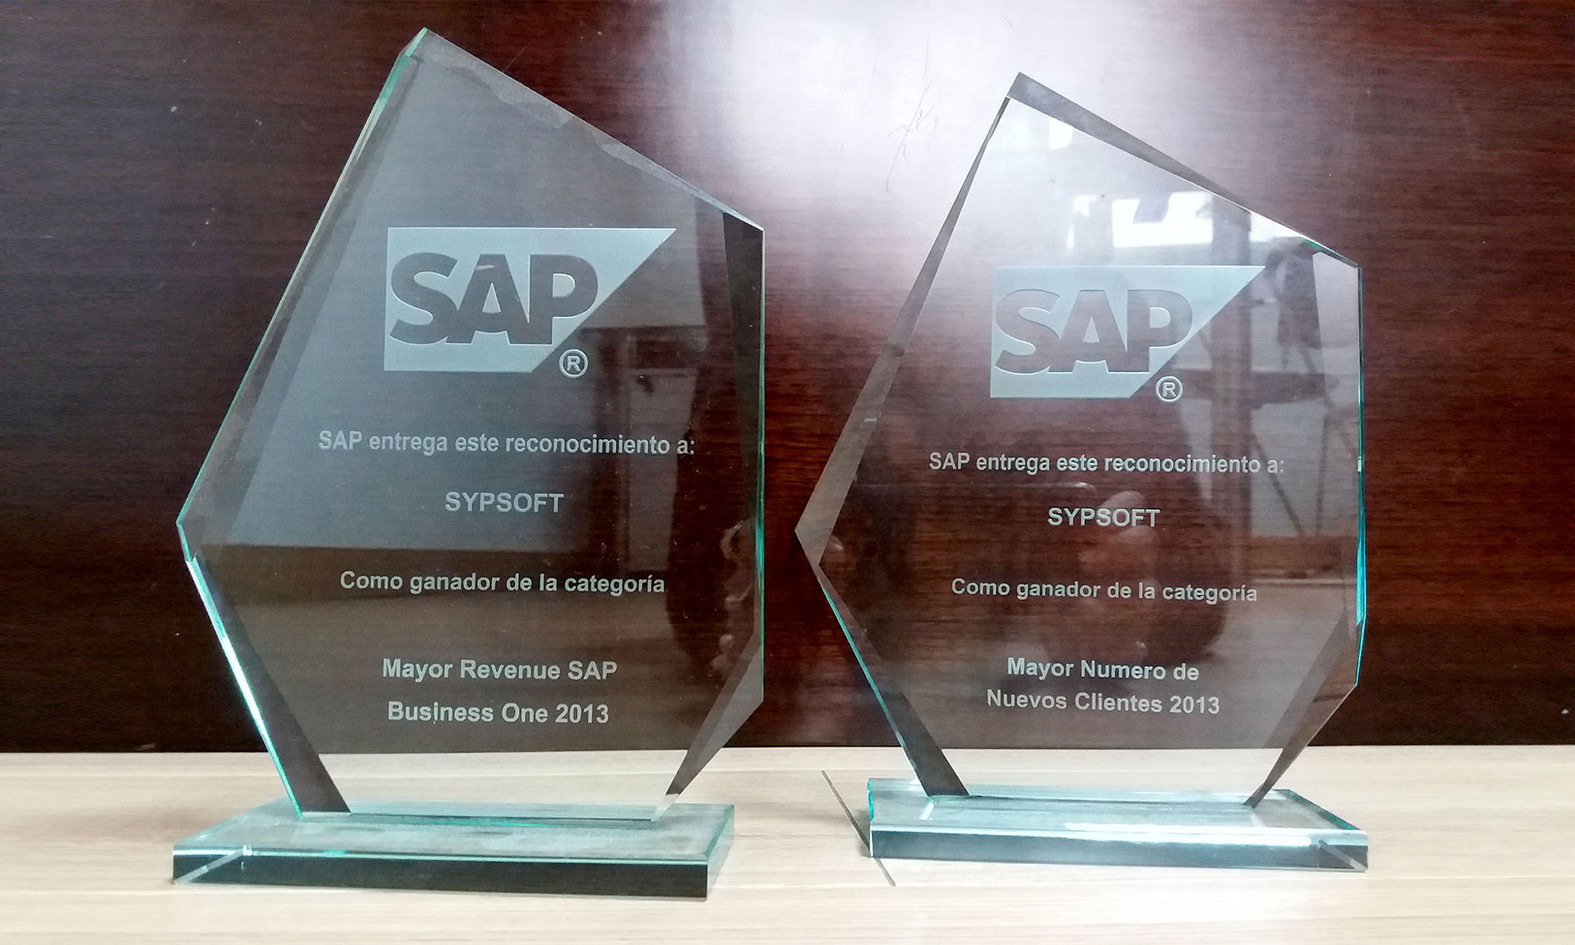 Mayor Revenue SAP - Business One